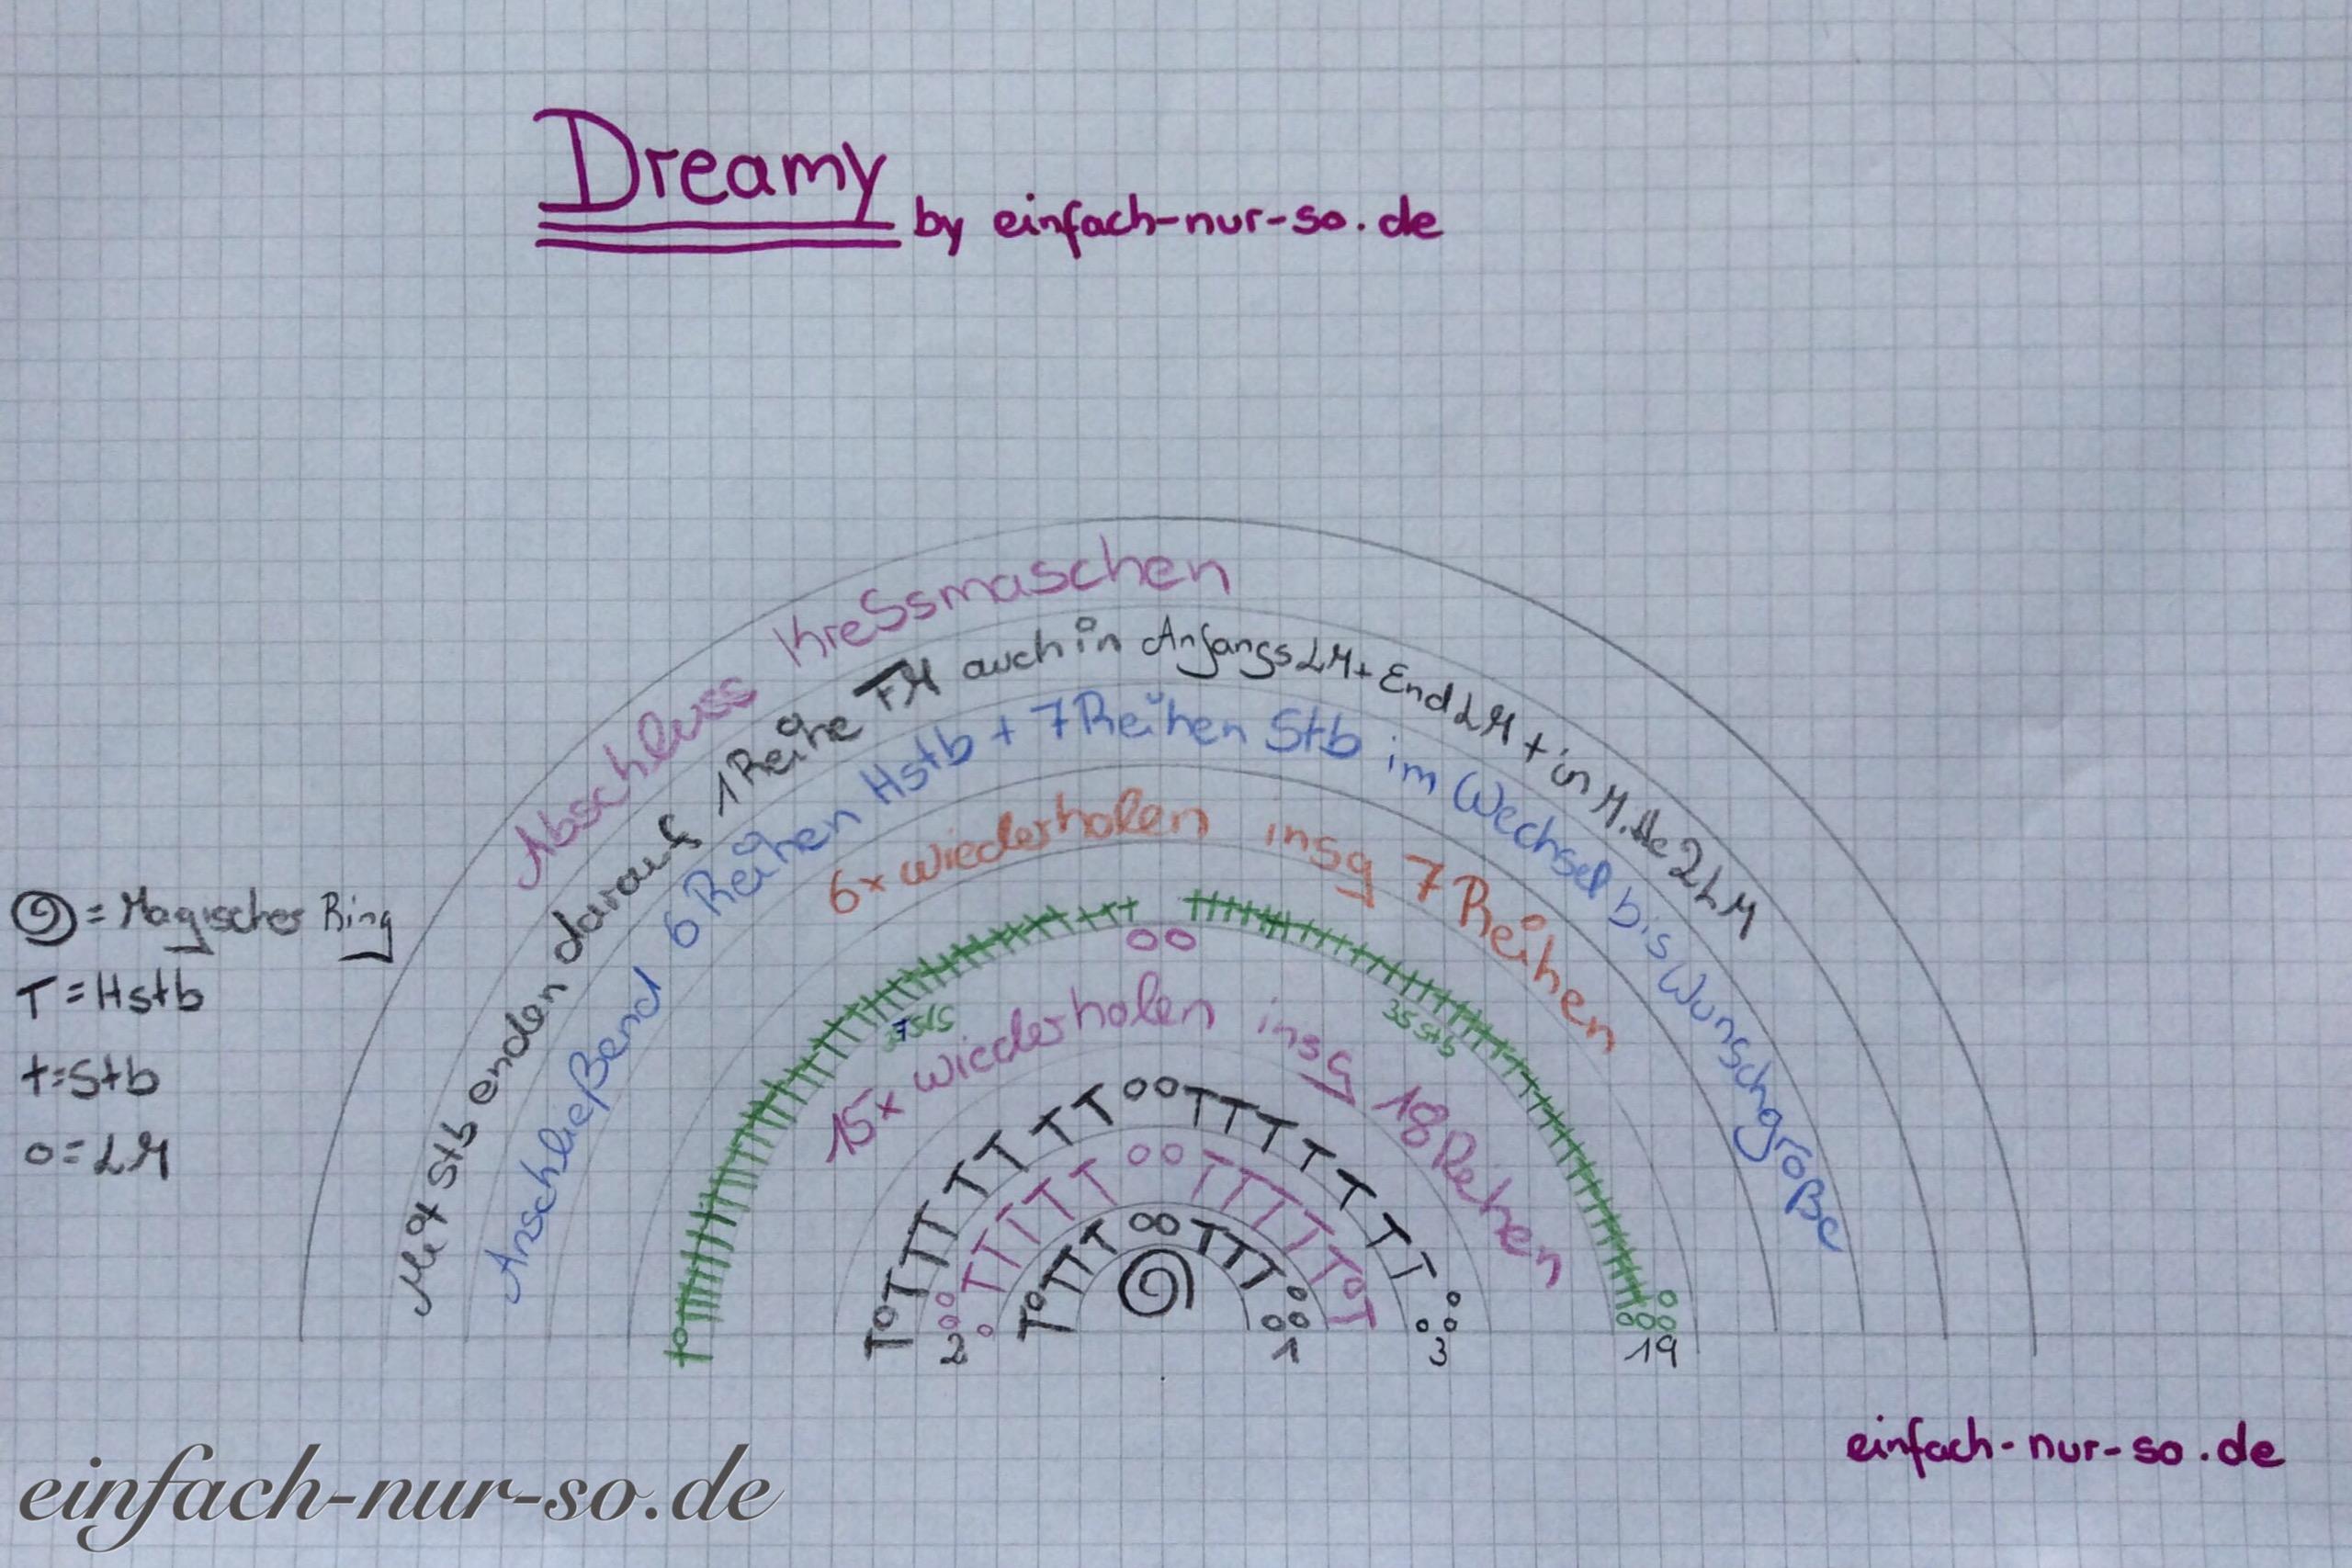 Anleitung Dreieckstuch Dreamy Einfach Nur Sode